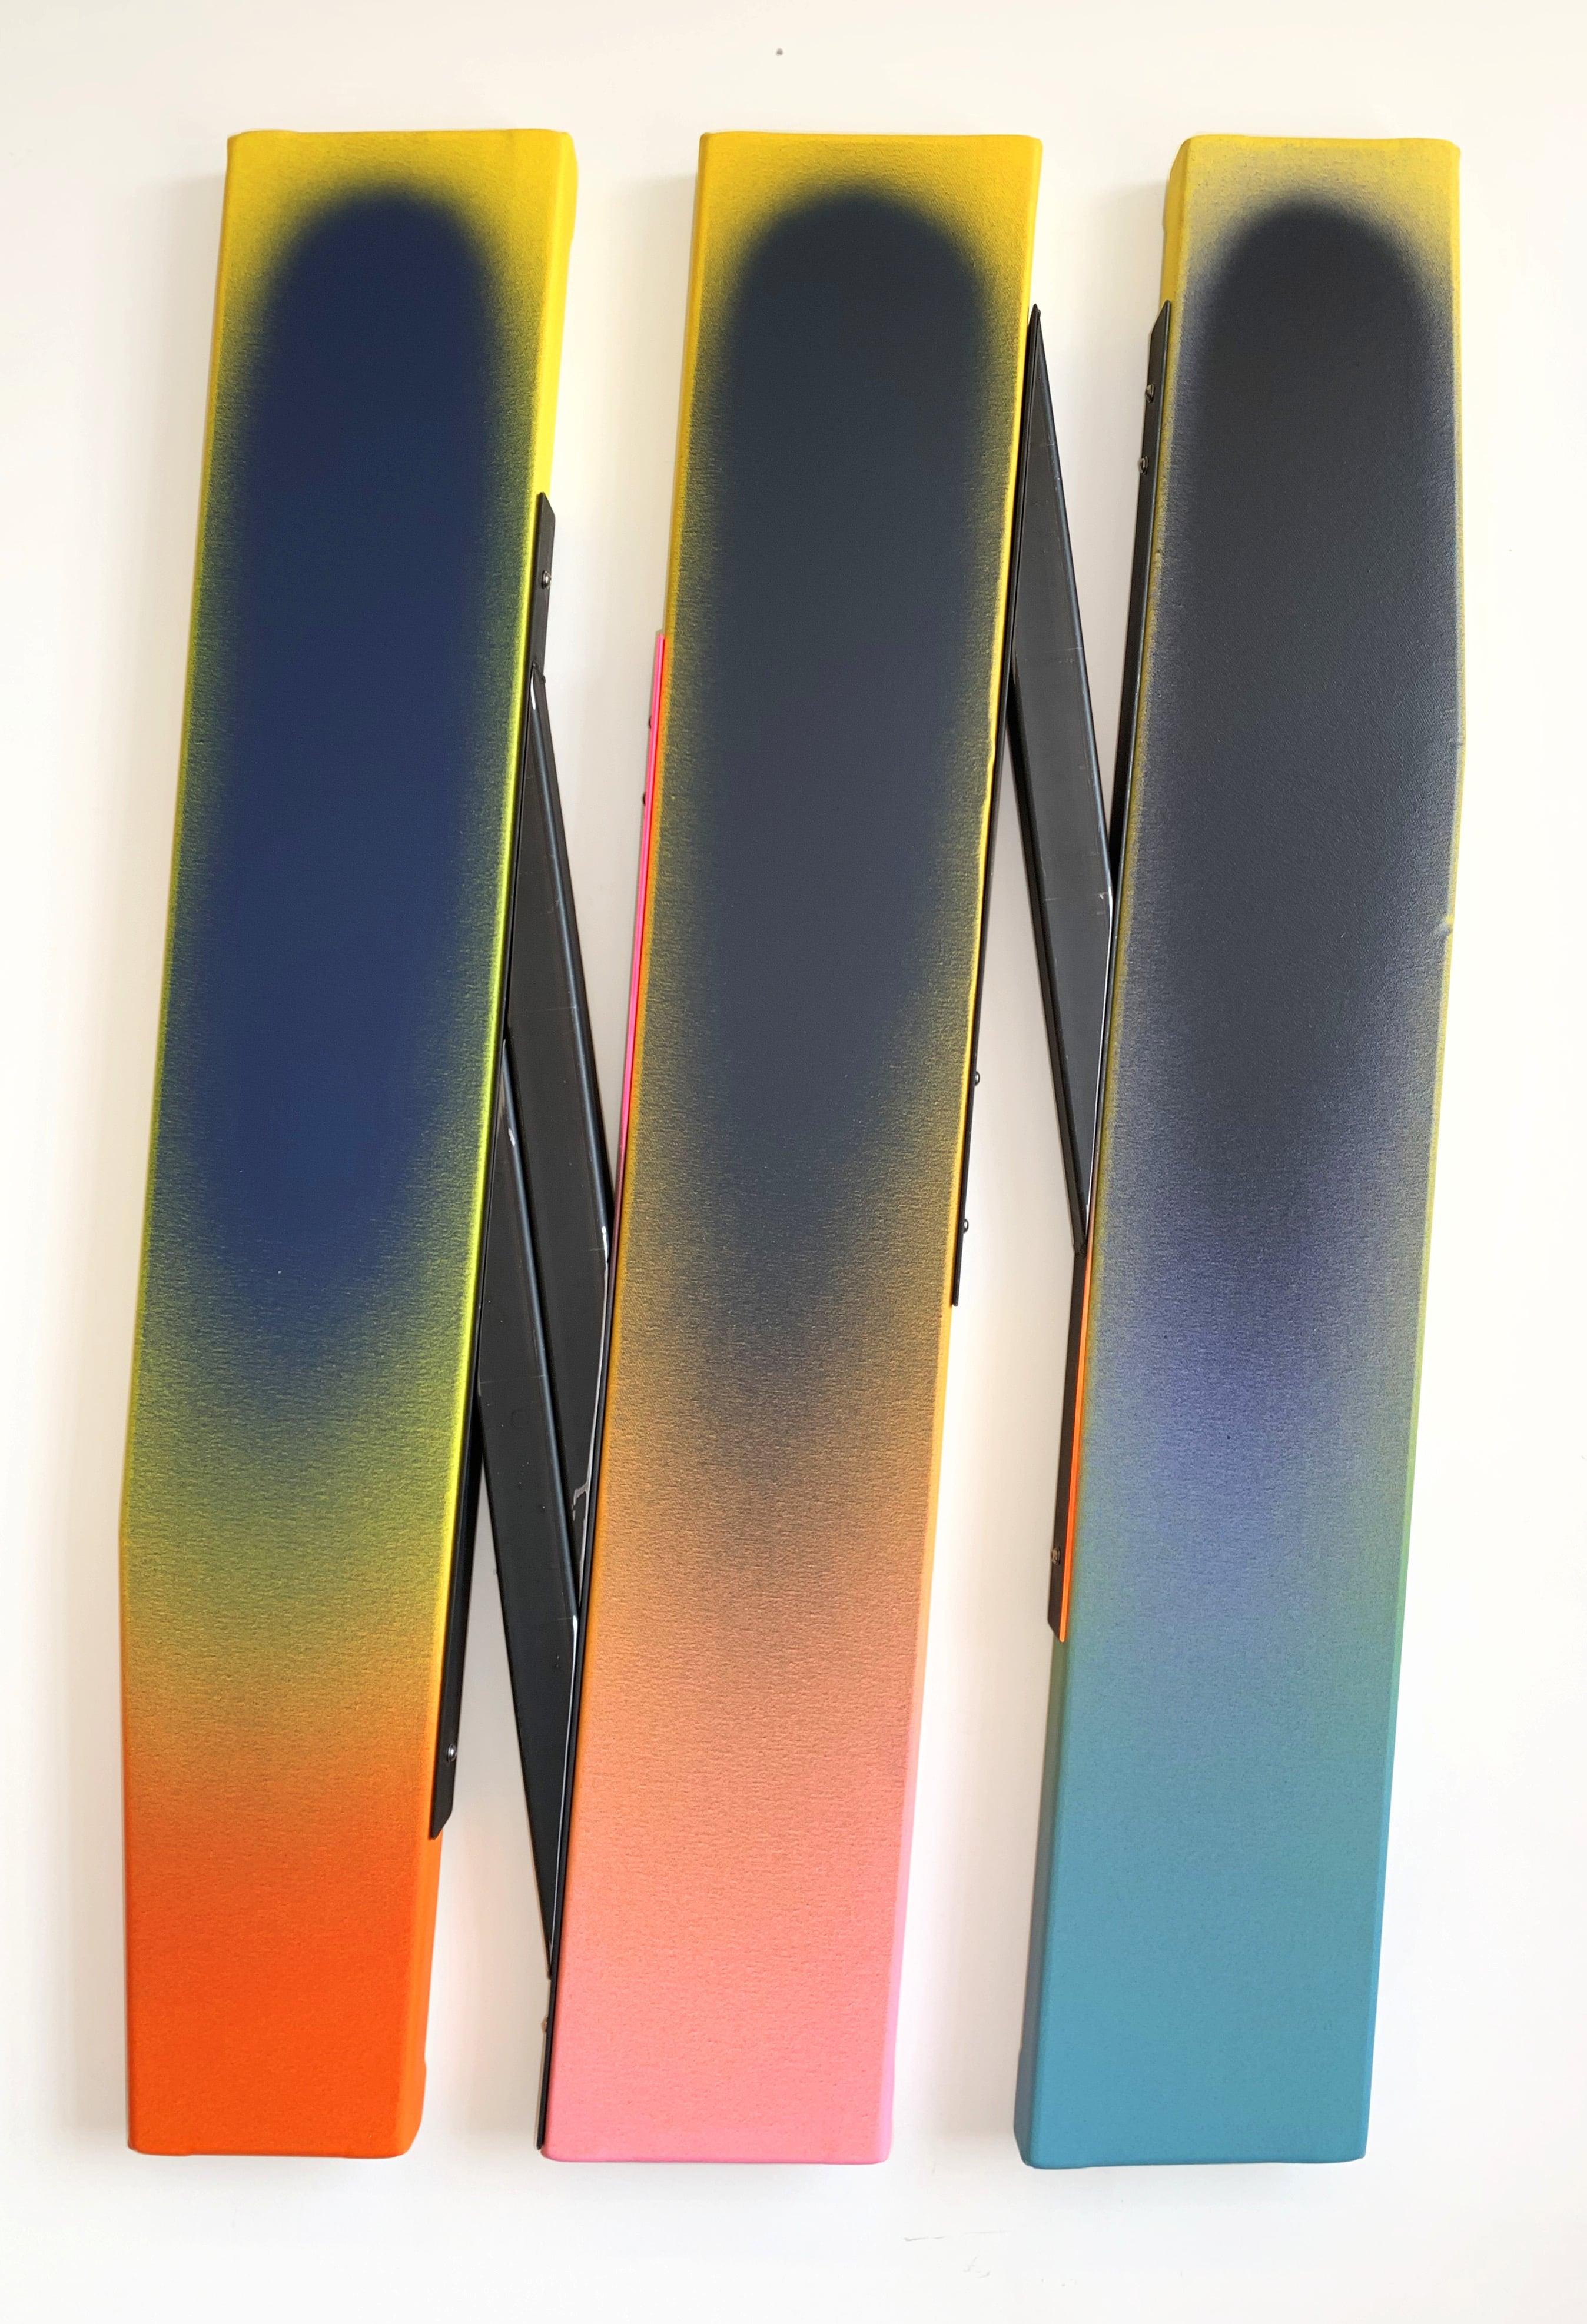 NemesM_The-Better-Self-04_2020_132x88cm_acrylic-carpaint-canvas-steel-wood-min